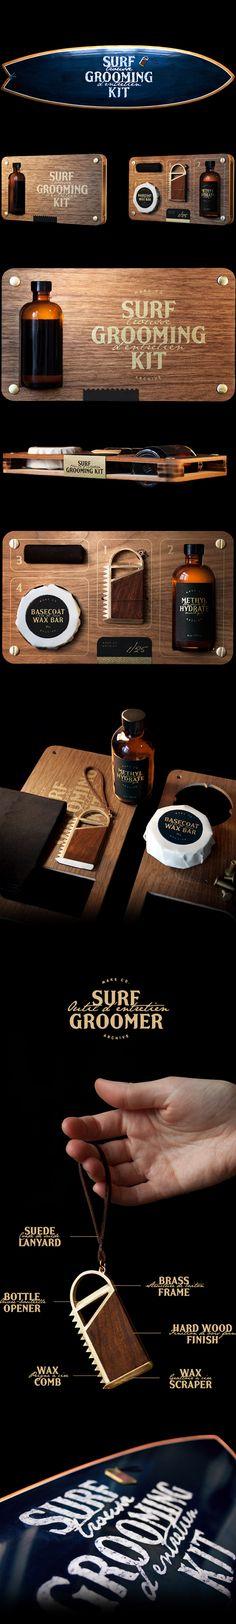 ethos / Surf Grooming Kit - Product identity & packaging